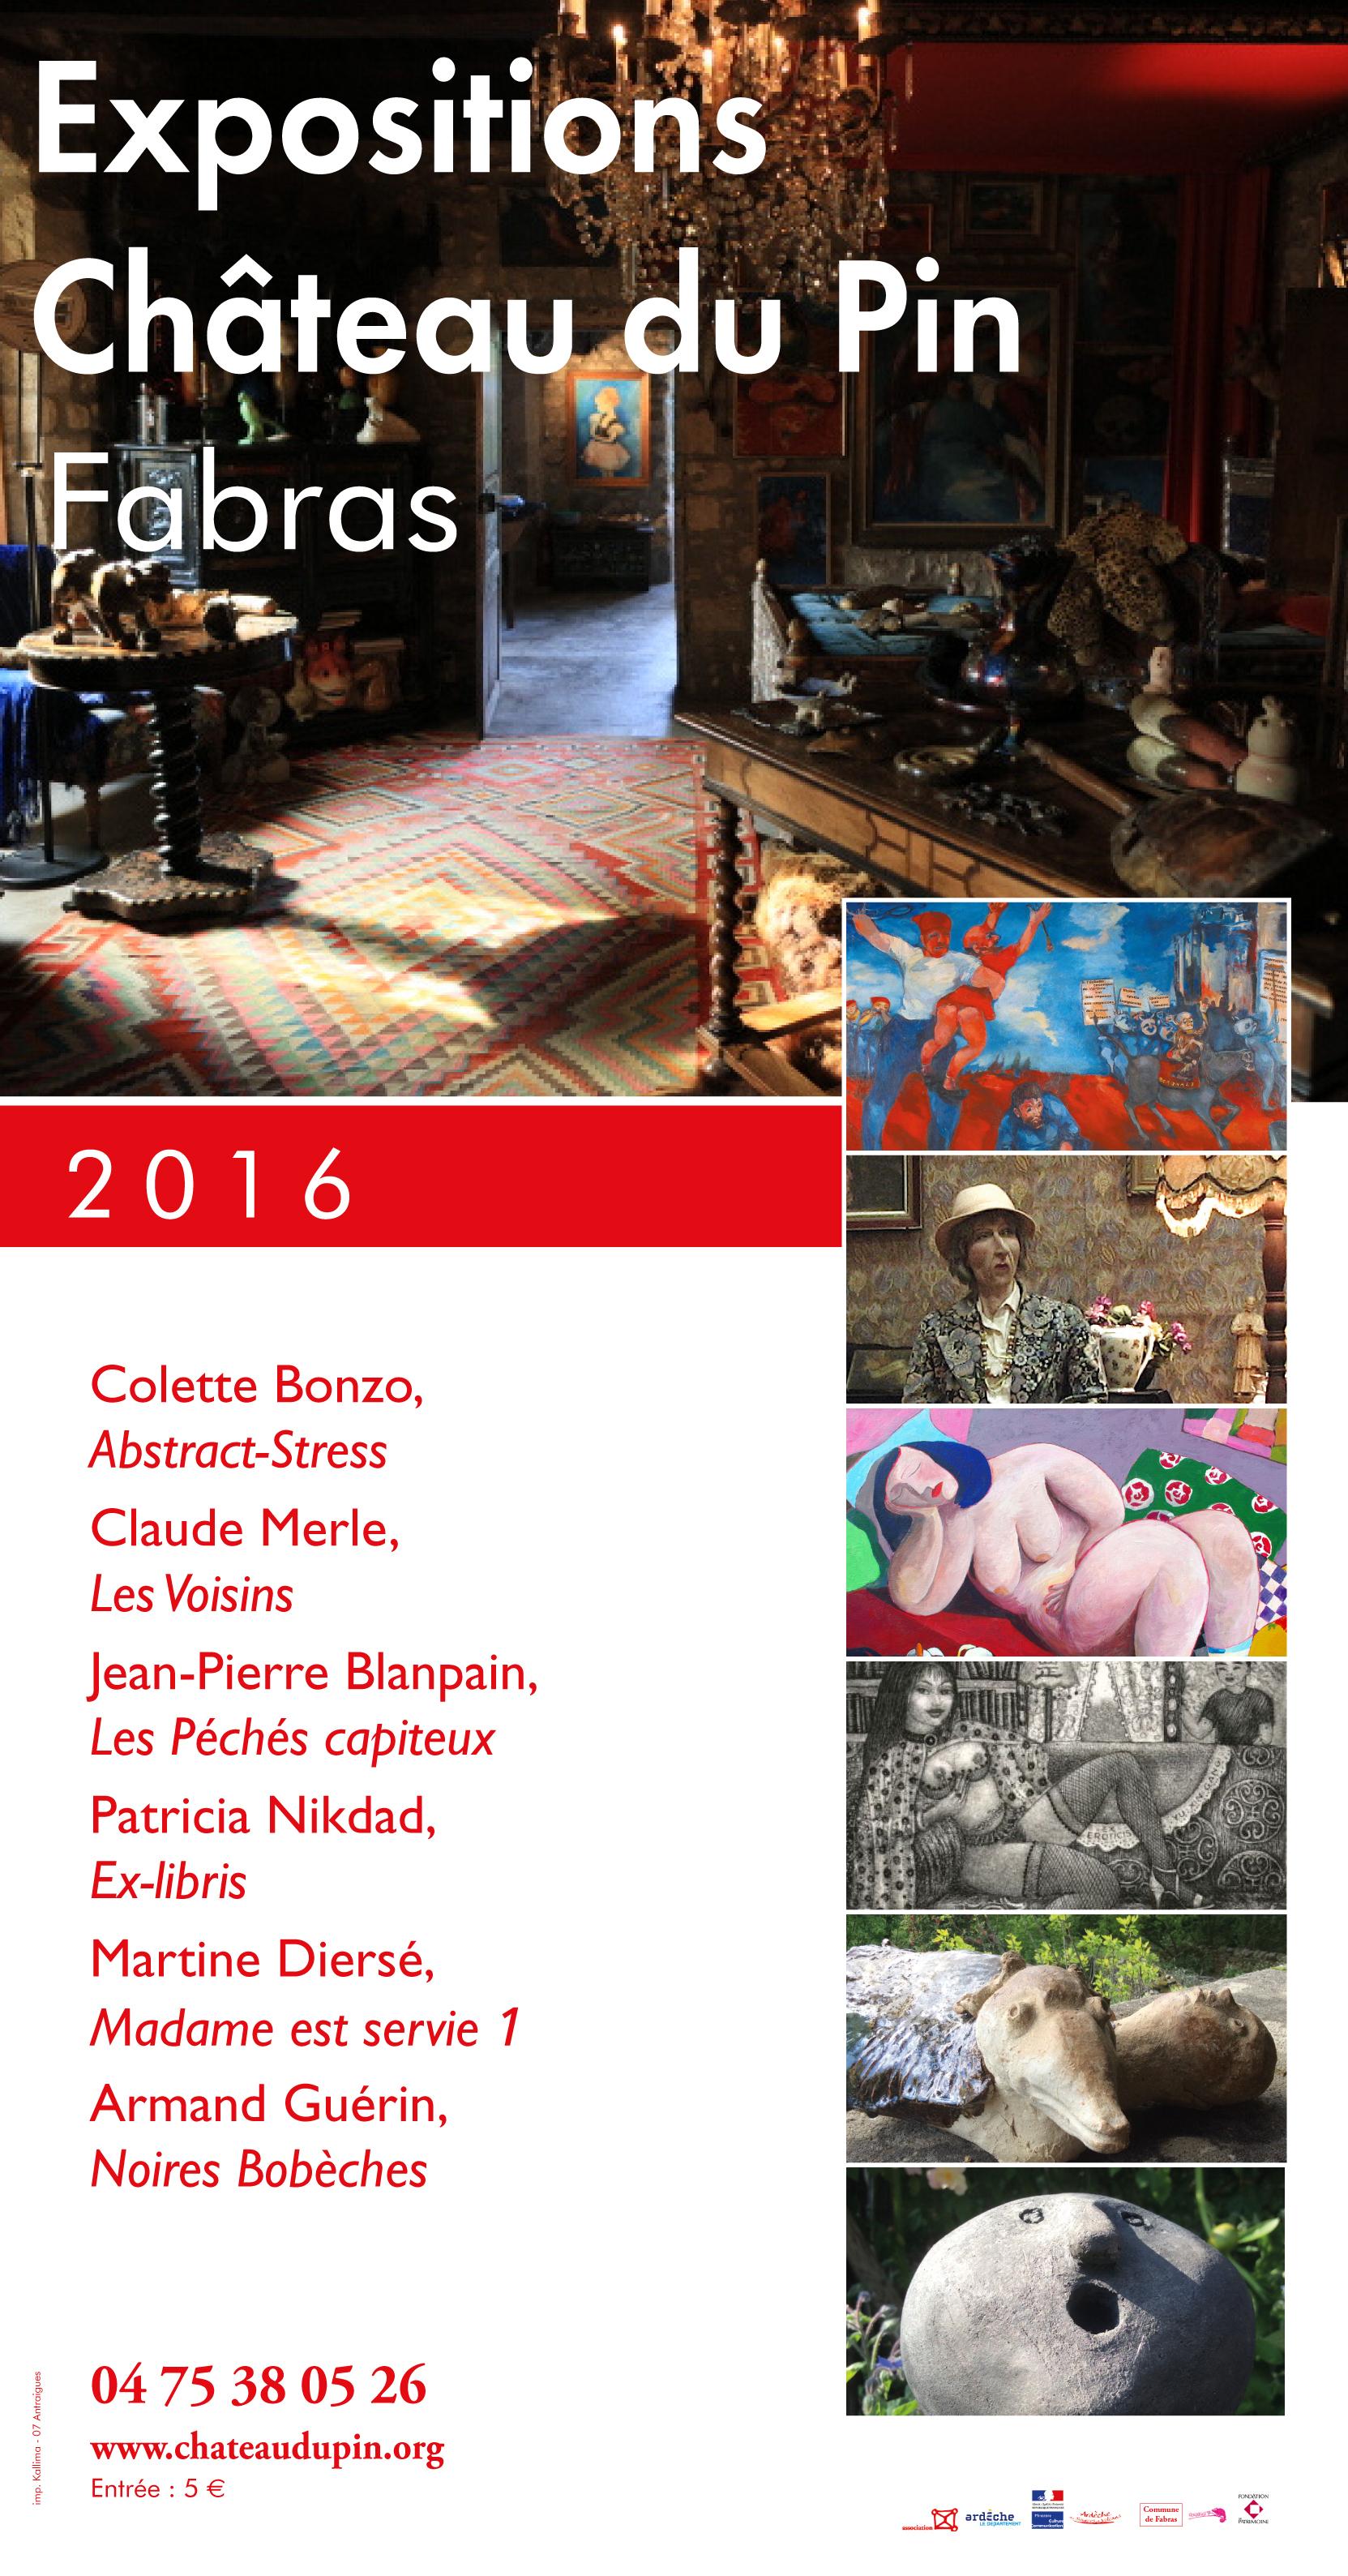 aff-lepin-chateau-2016.jpg